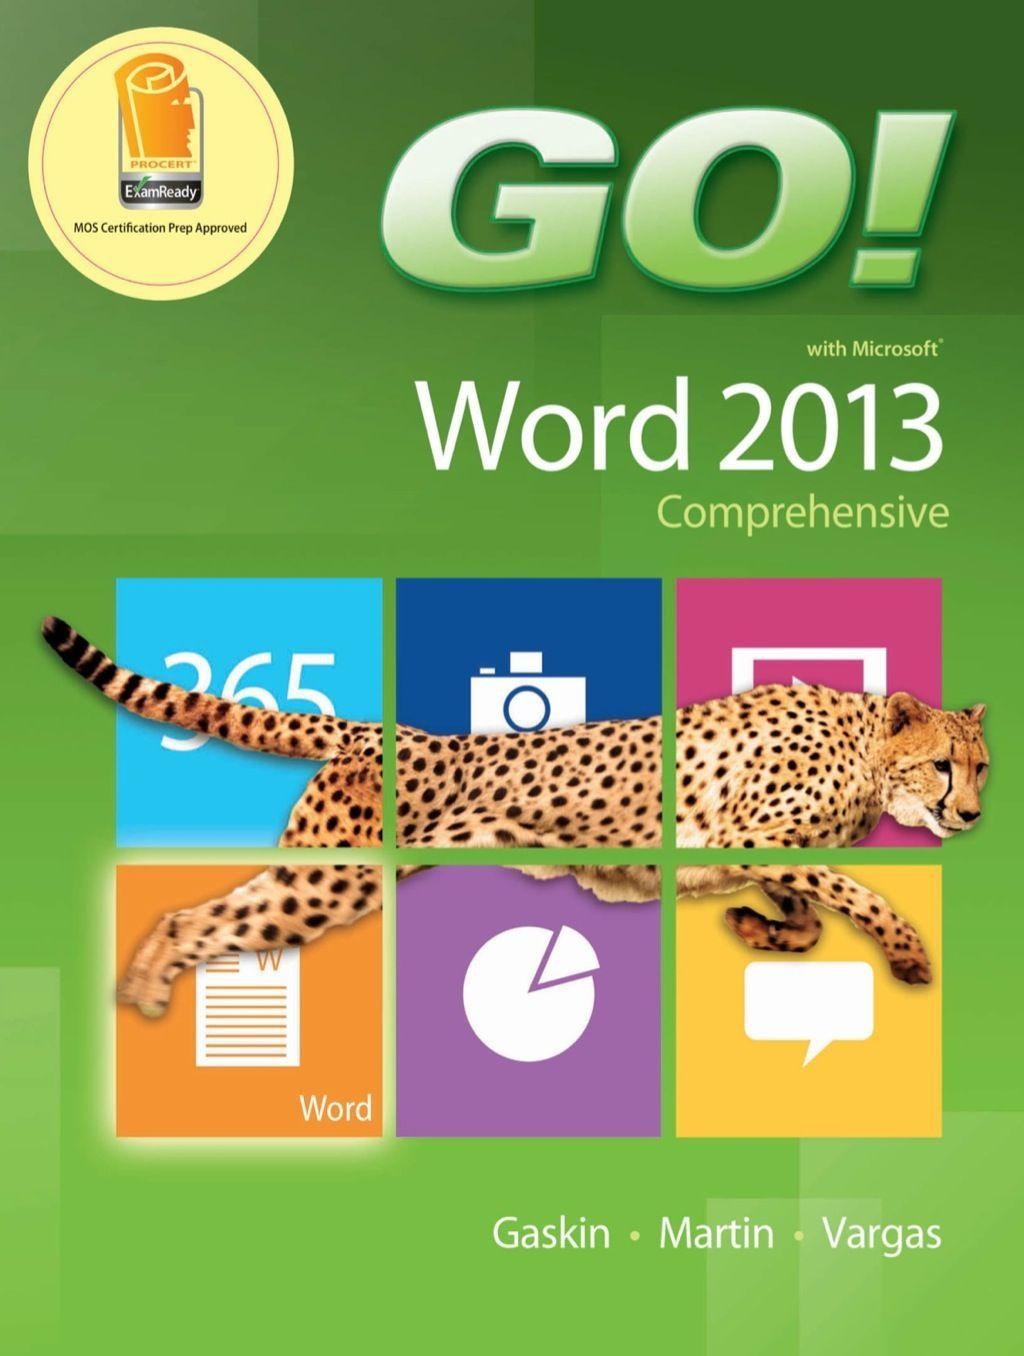 Go With Microsoft Word 2013 Comprehensive Ebook Rental Excelwordaccessetc Go With Microsoft Word 201 Microsoft Office Microsoft Excel Microsoft Powerpoint